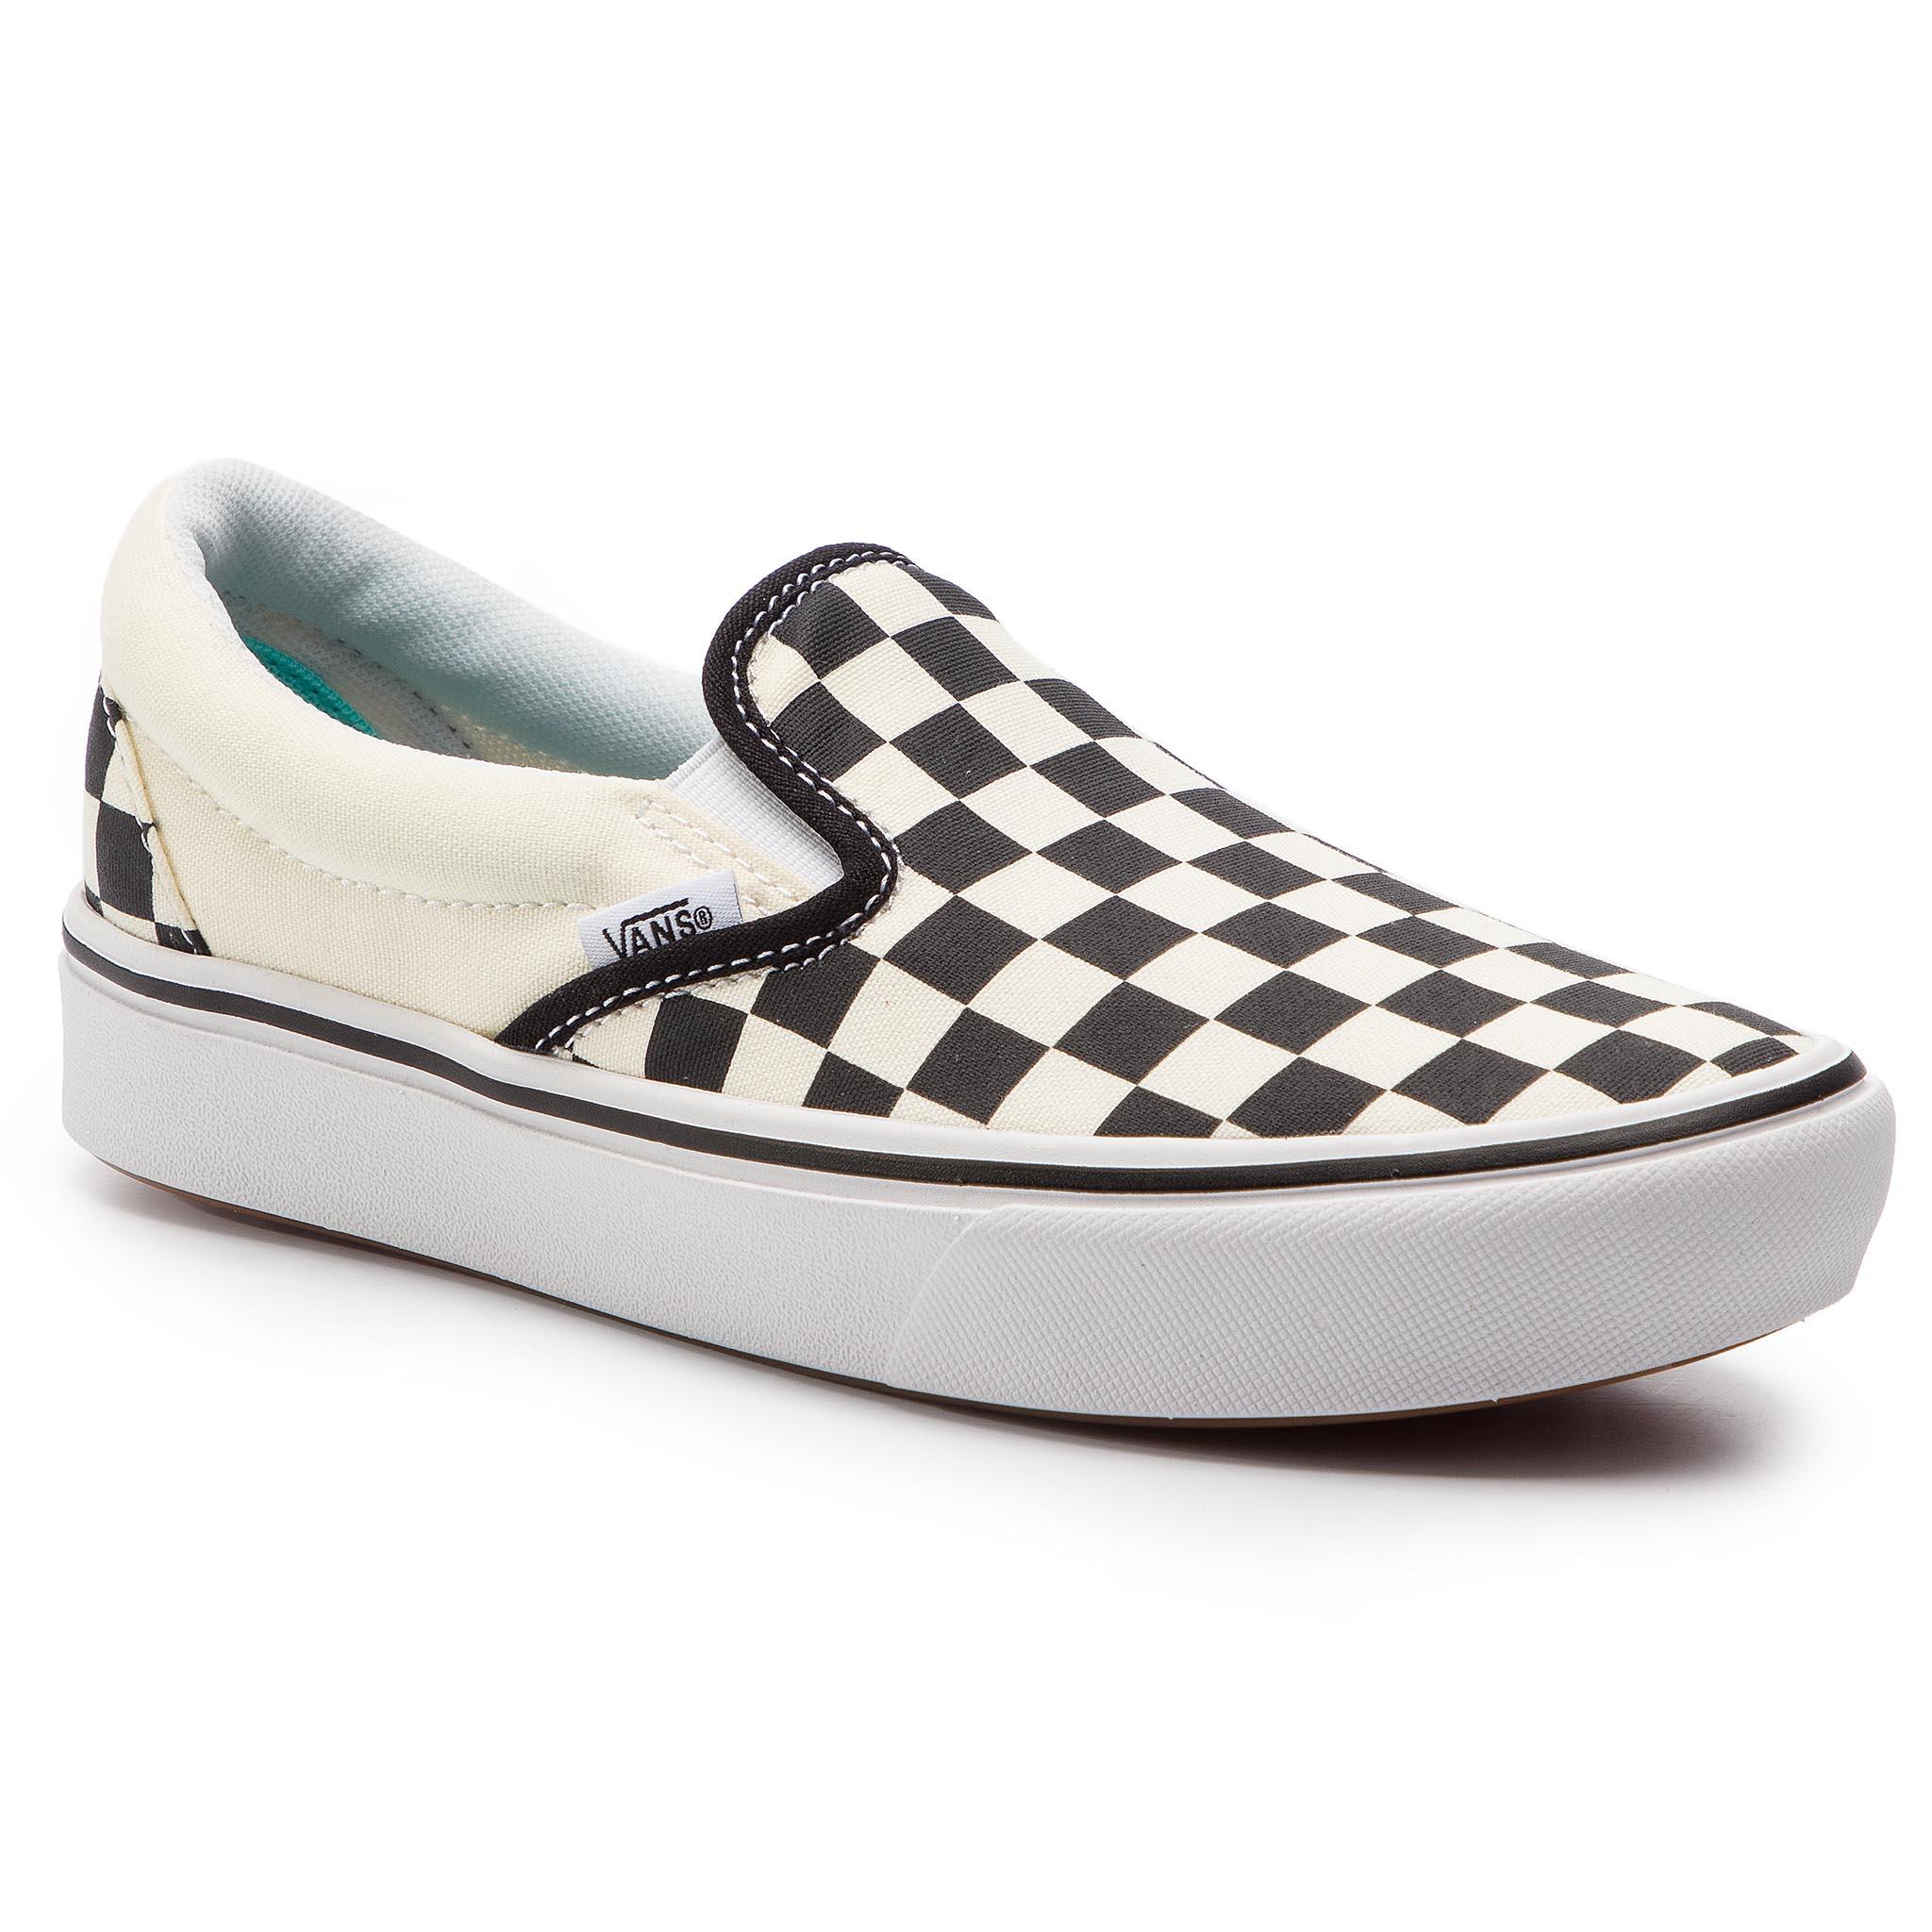 c0ba289d90f Πάνινα παπούτσια VANS - Comfycush Slip-On VN0A3WMDVO41 (Classic ...